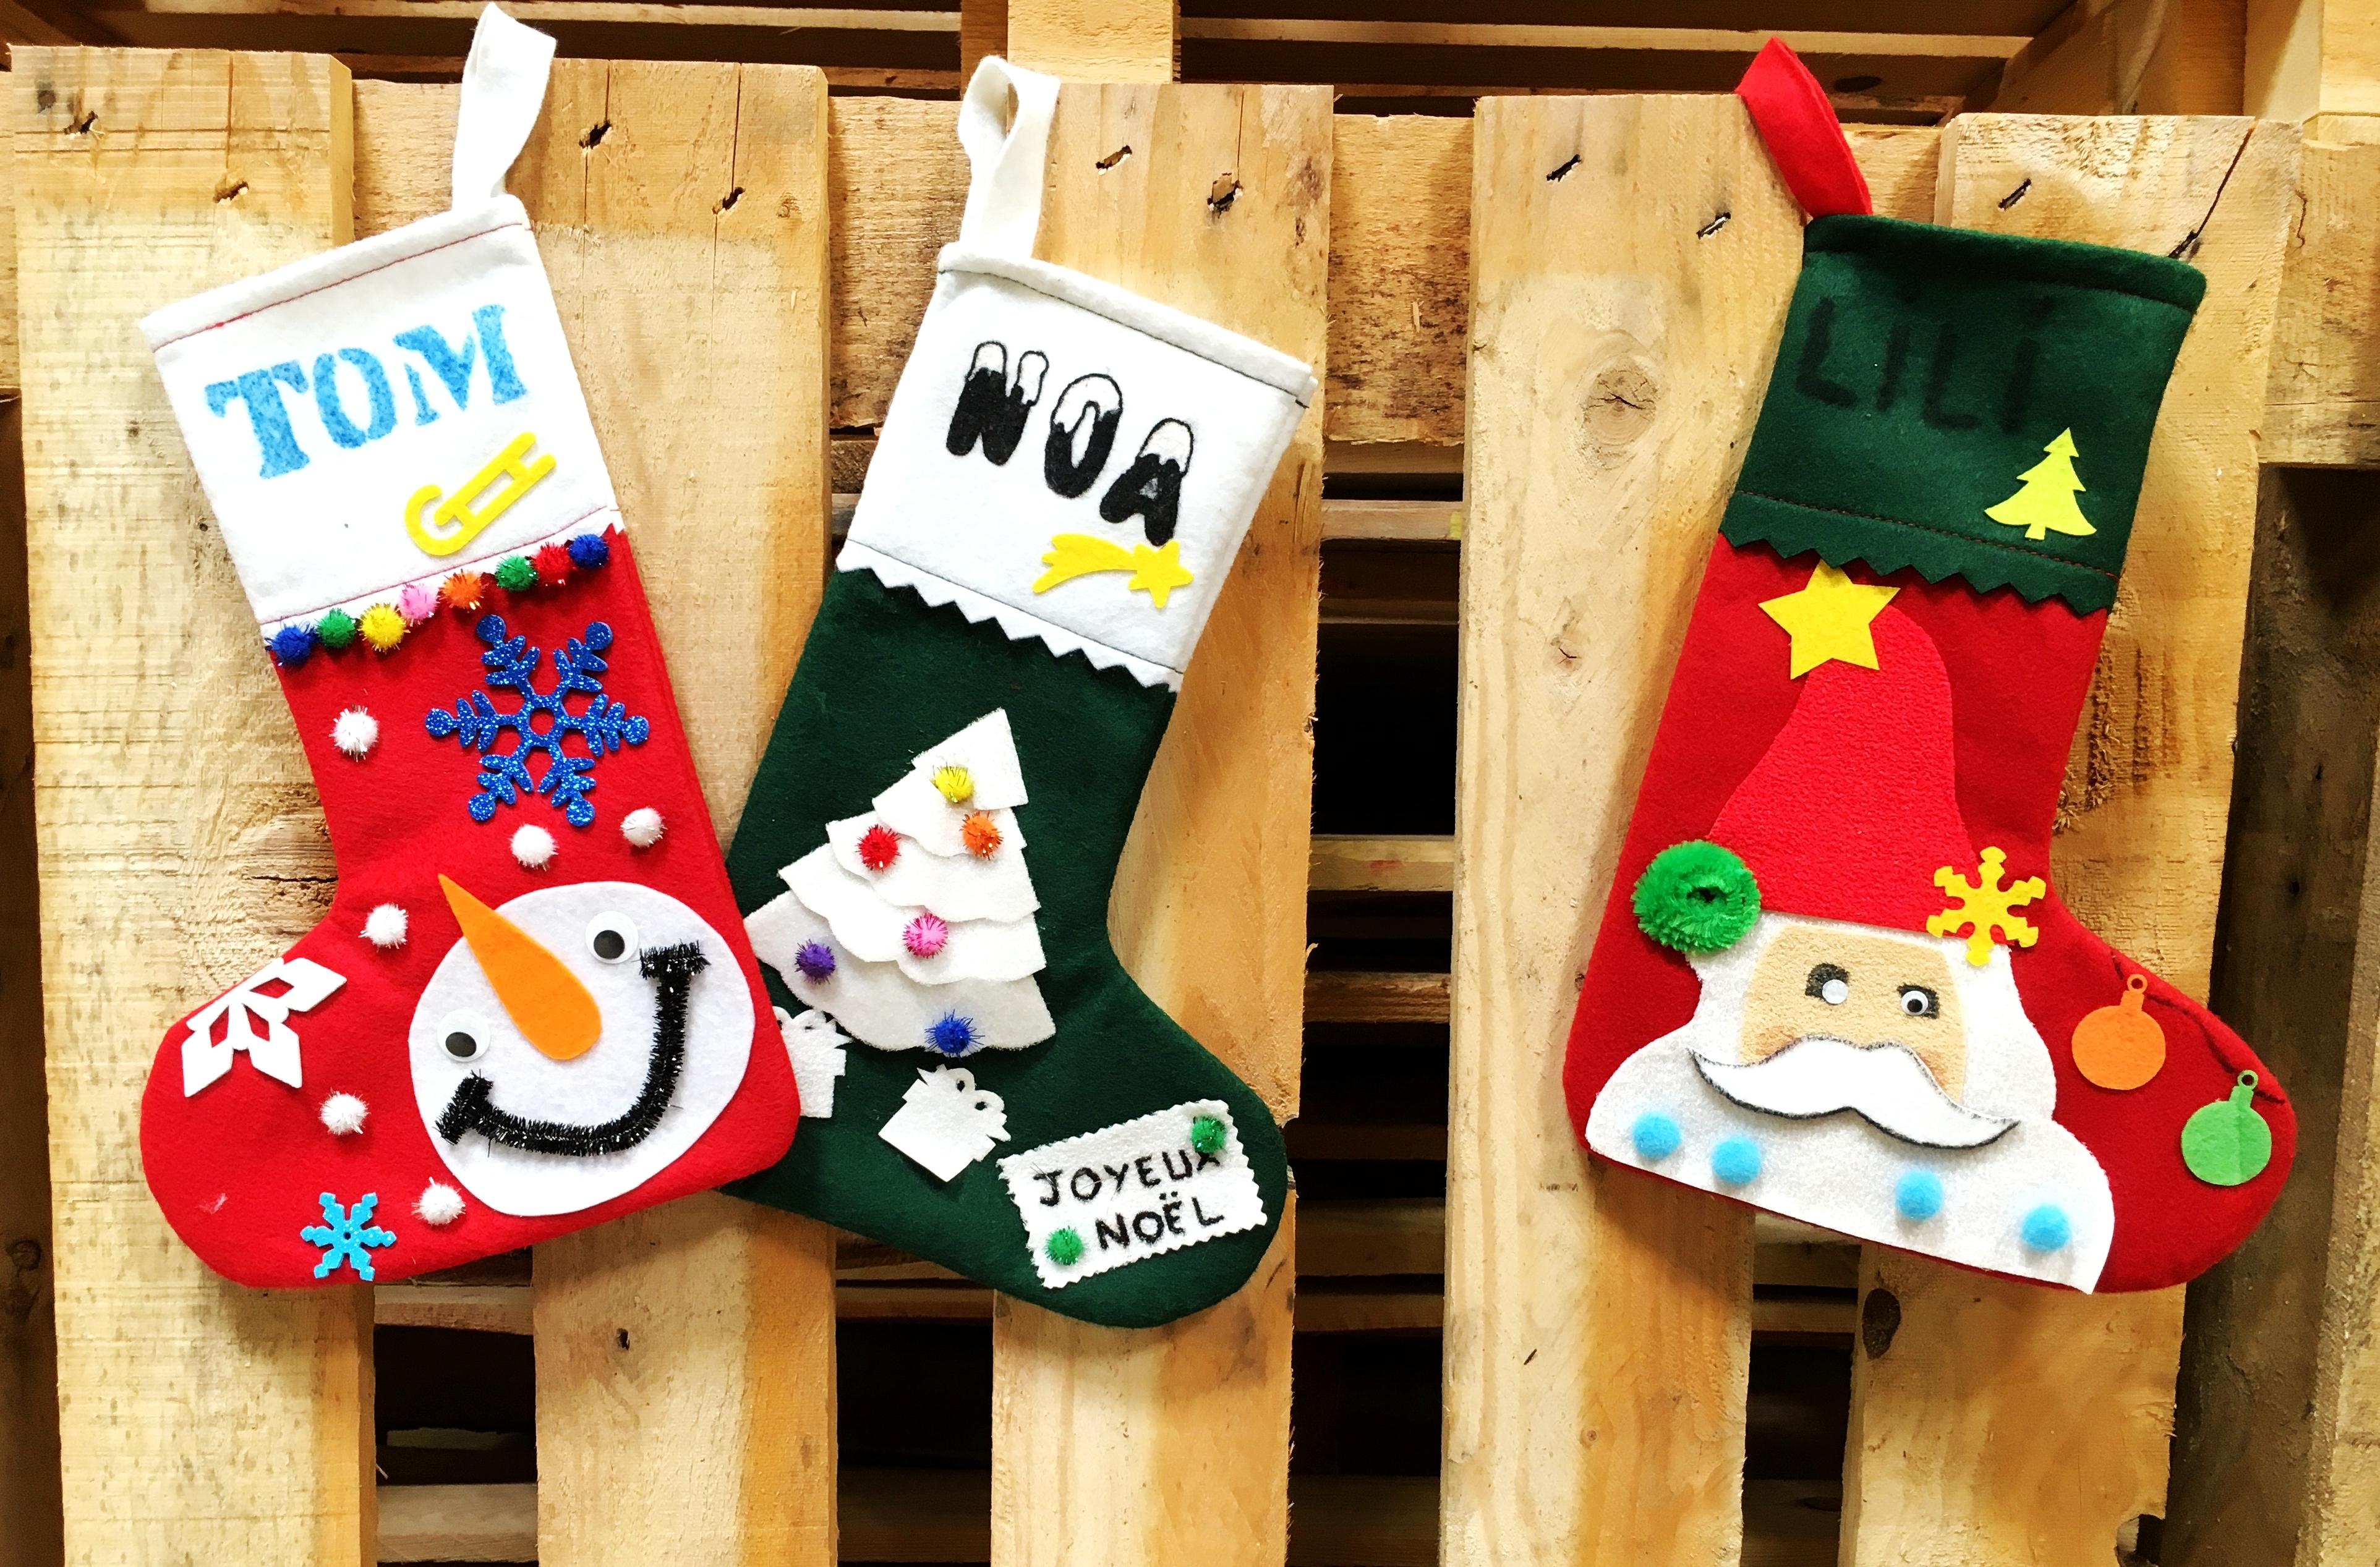 Fabriquer Deco Noel En Feutrine kit chaussettes noel en feutrine 10 couleurs sodertex objet